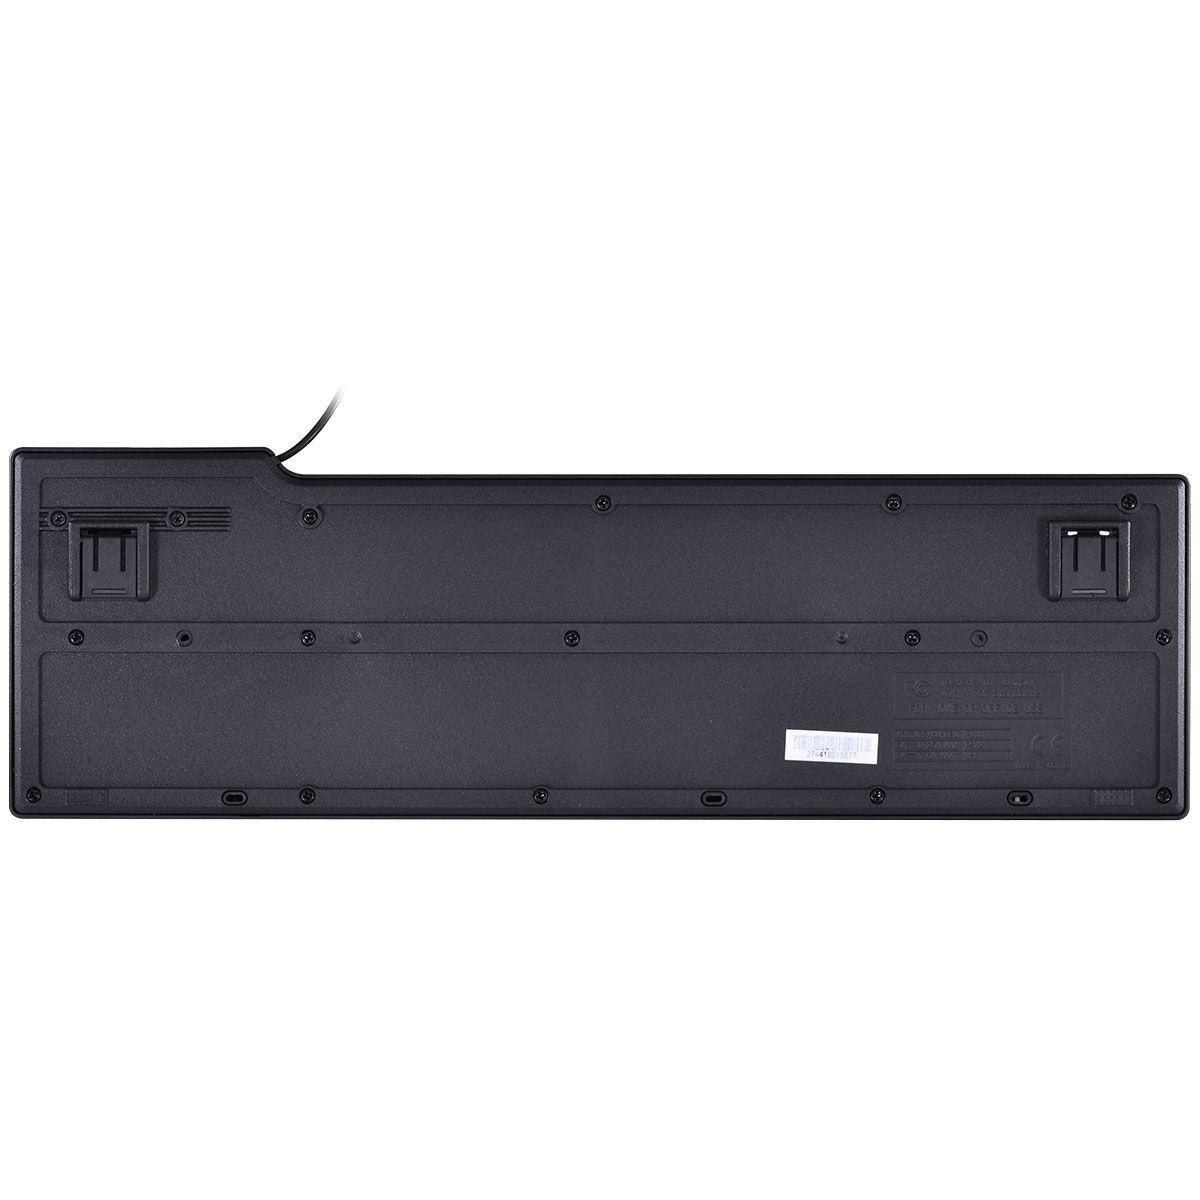 TECLADO COMPACTO USB DYNAMIC ABNT2 1.8M PRETO - DT150